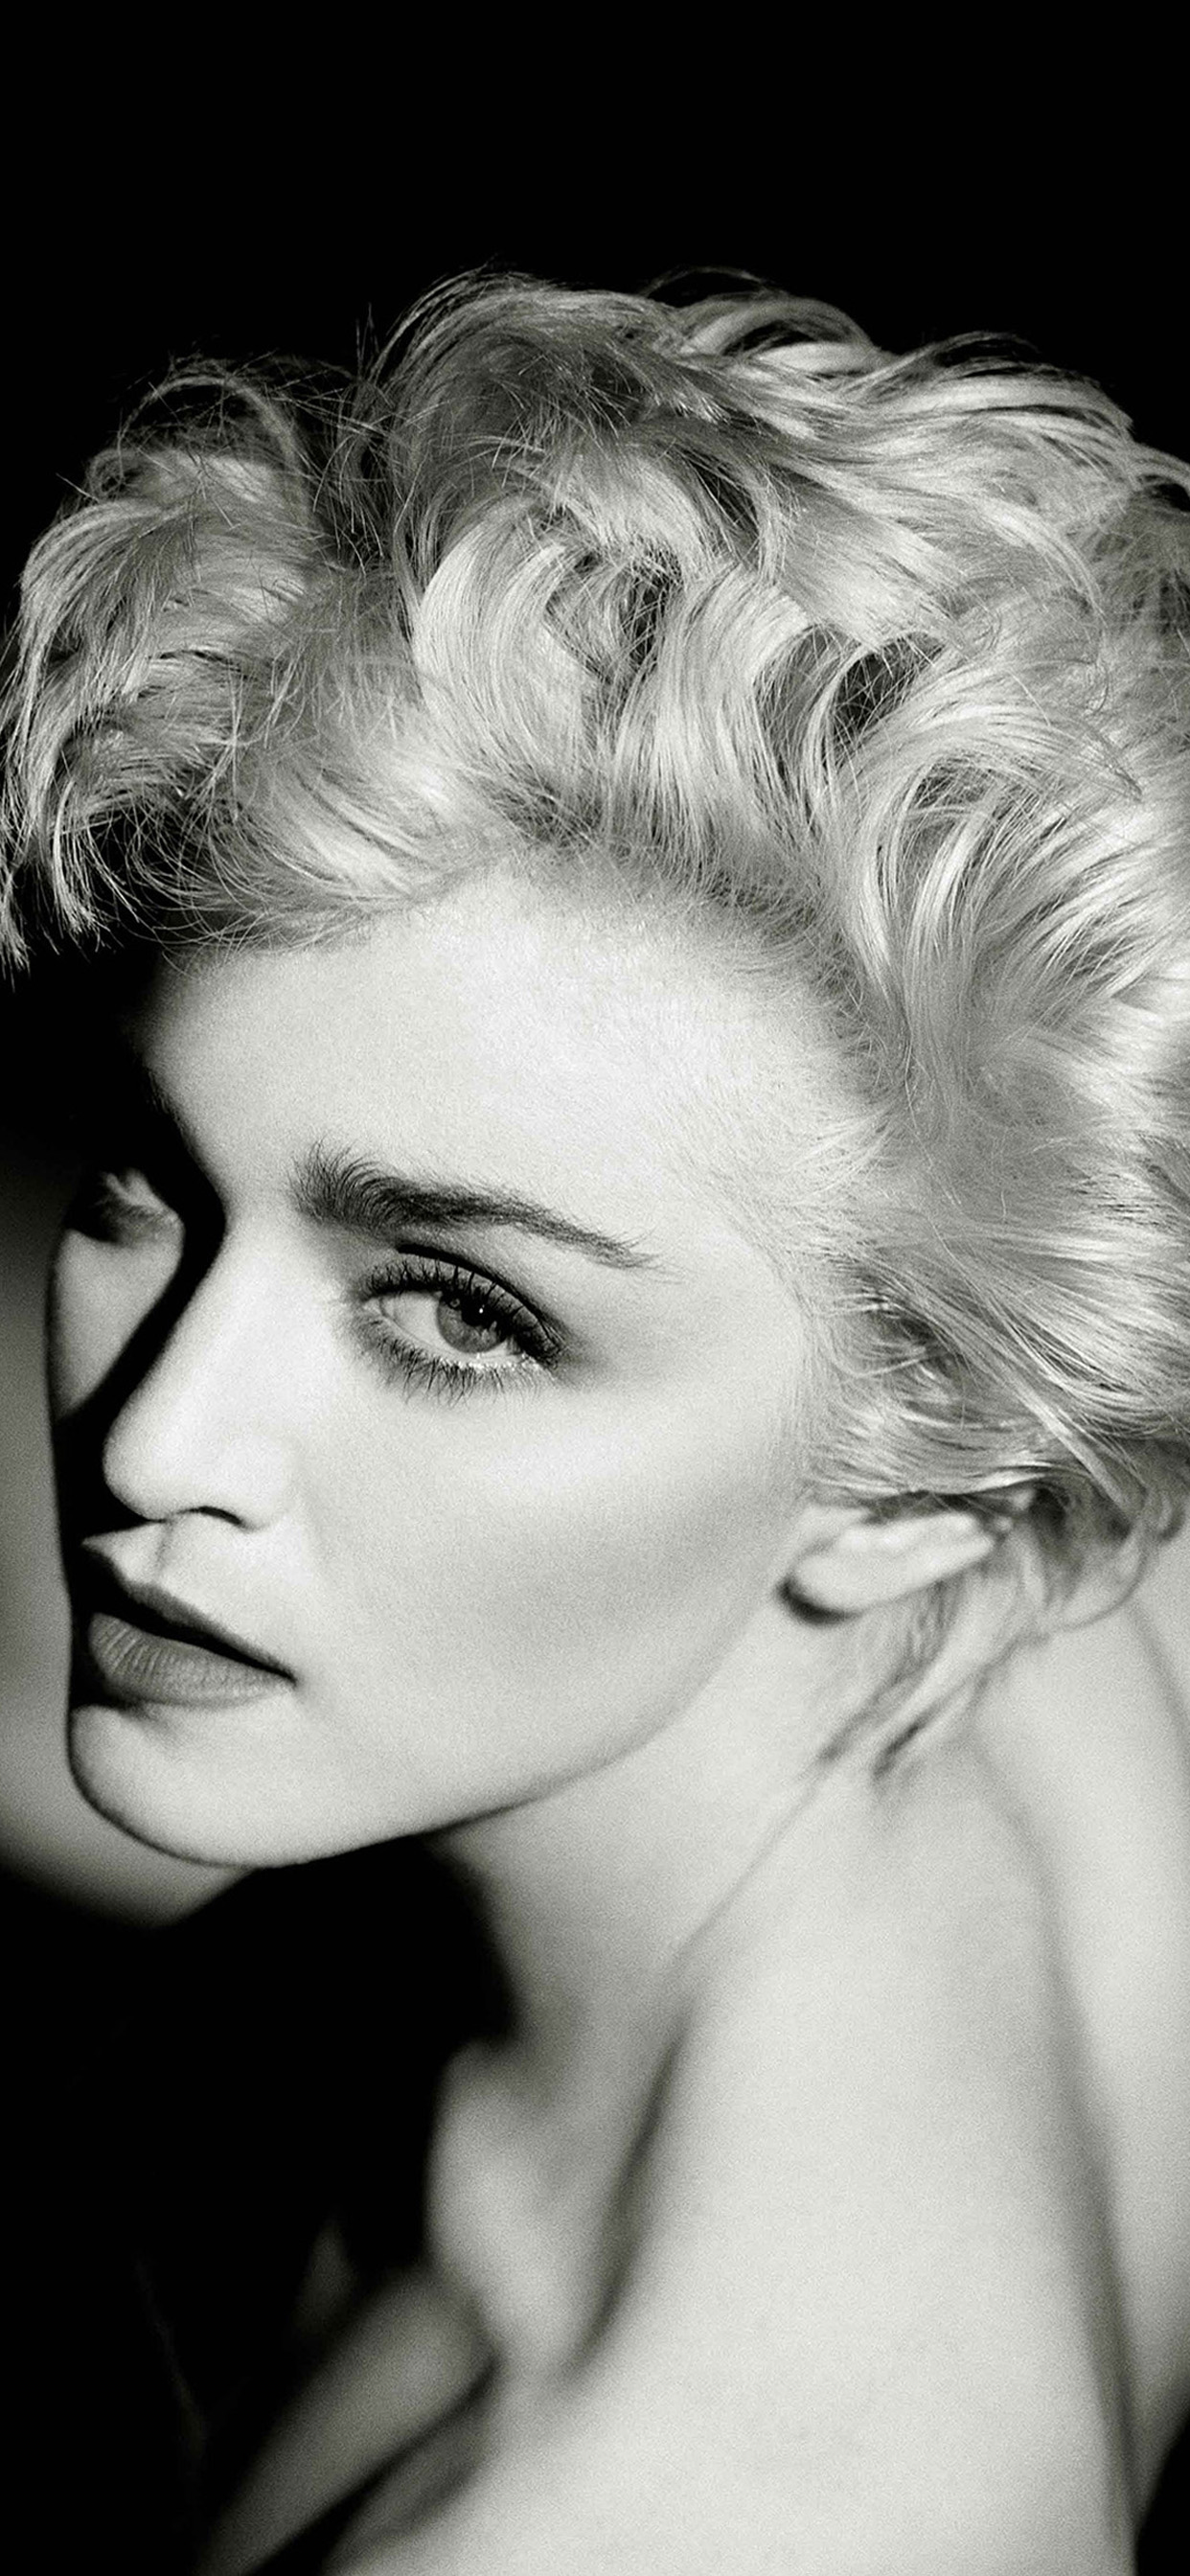 52 Madonna Dark Music Pop Celebrity Iphone Xs Max Wallpapers